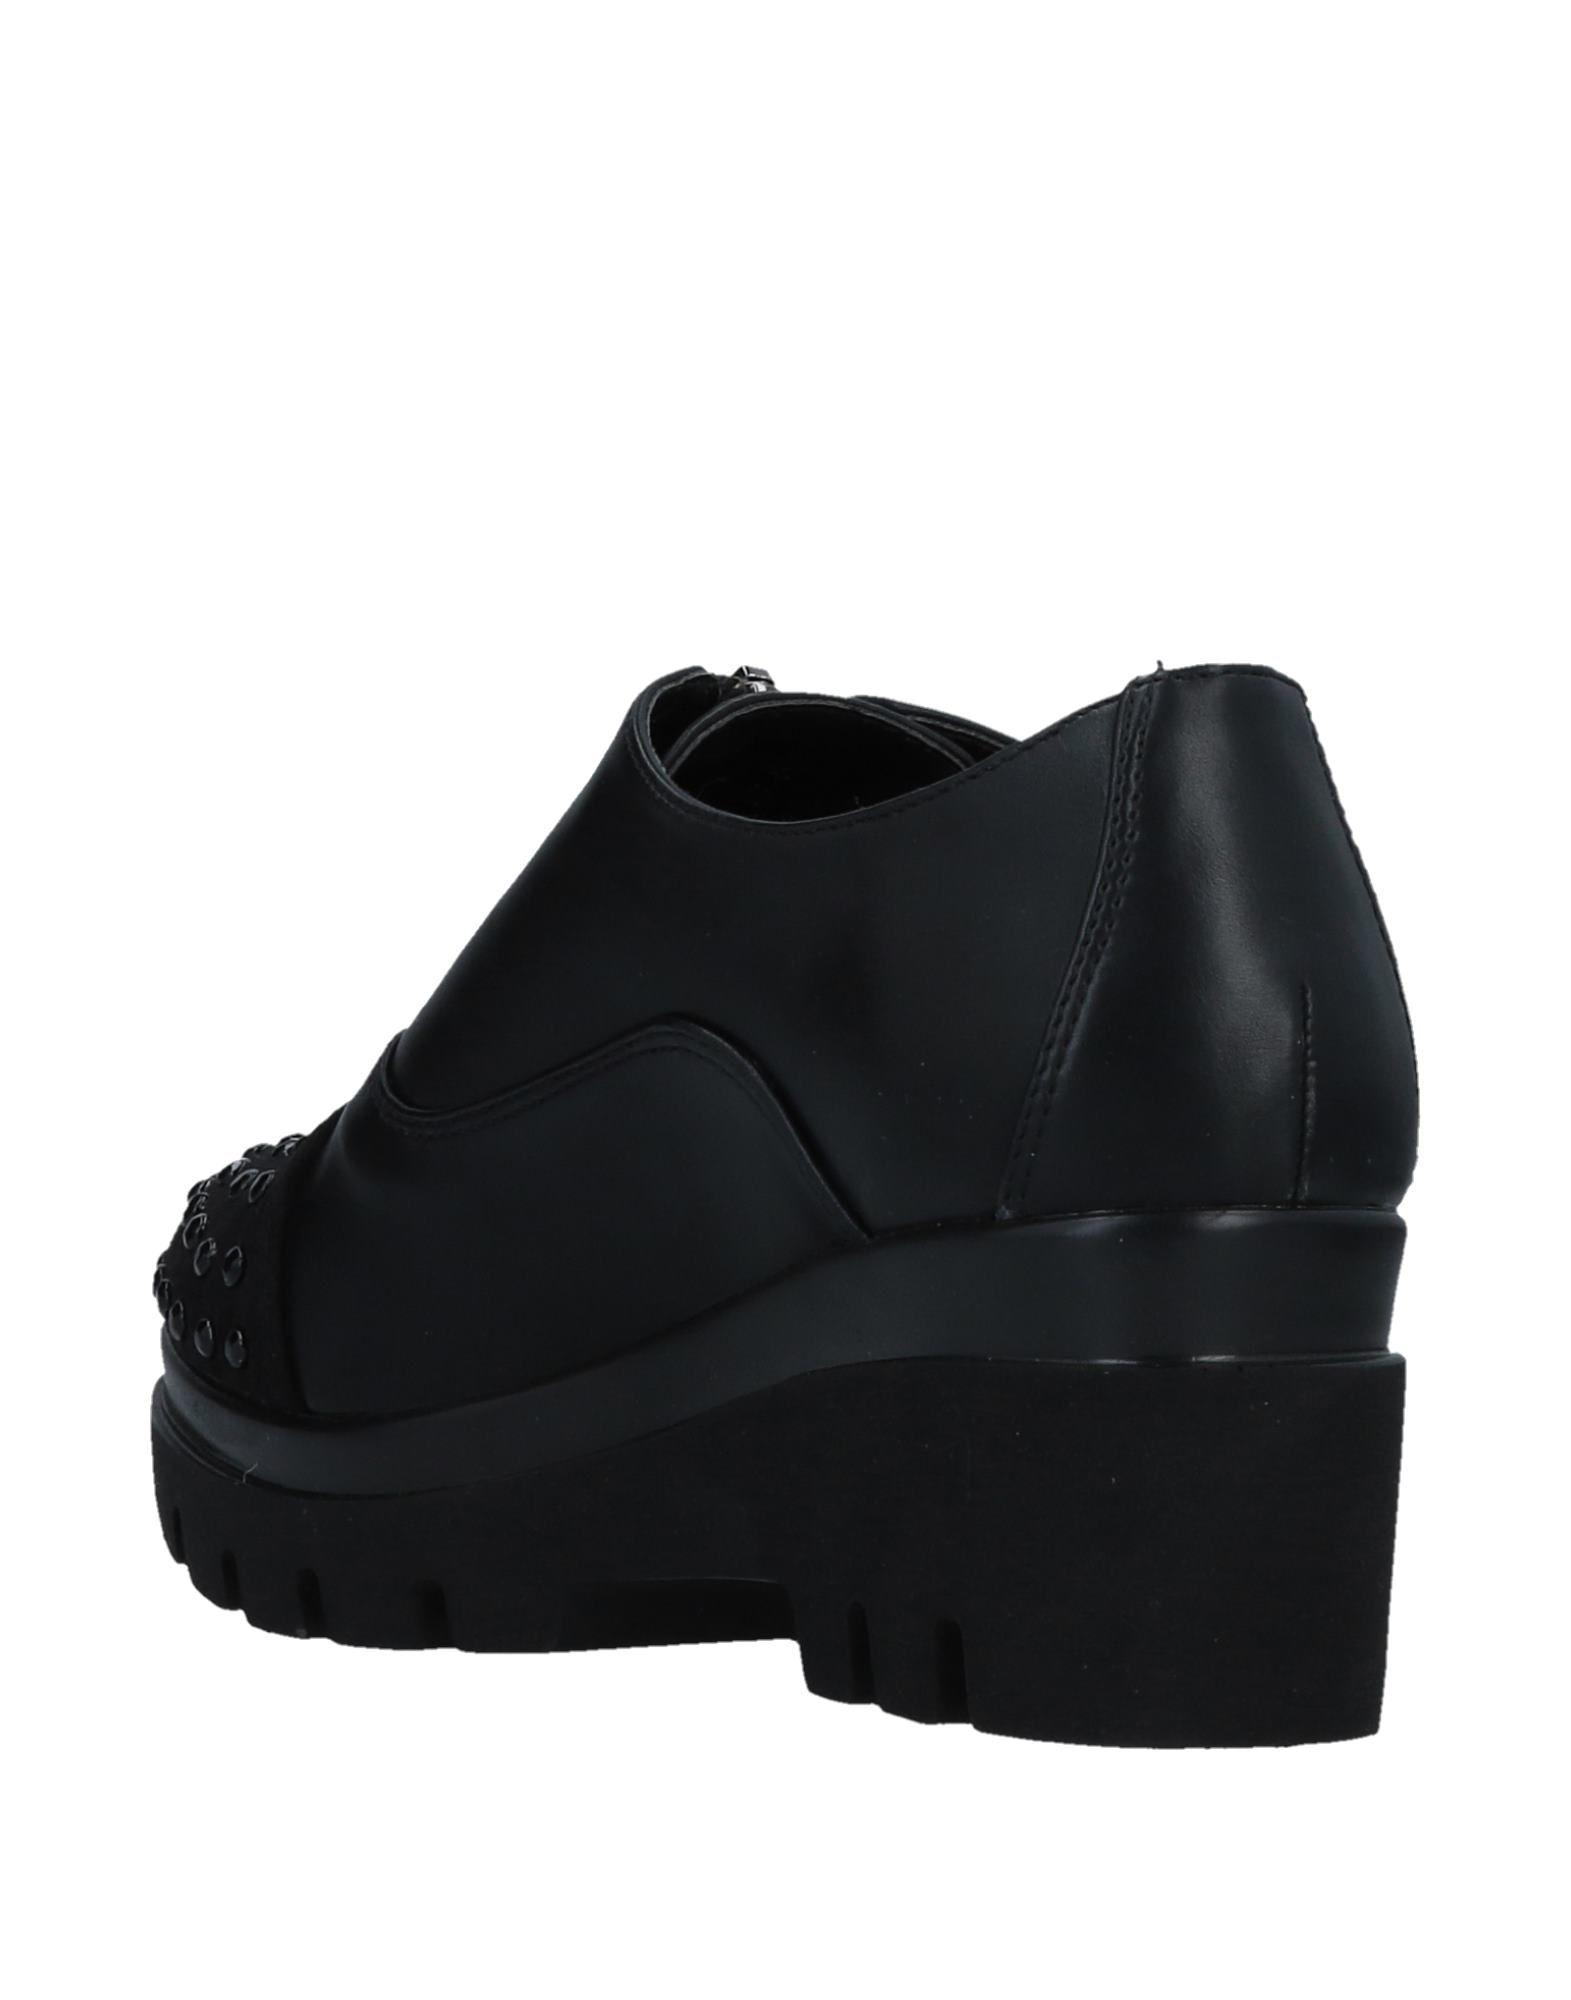 Laura Biagiotti Gute Mokassins Damen  11505756MQ Gute Biagiotti Qualität beliebte Schuhe 4b5032